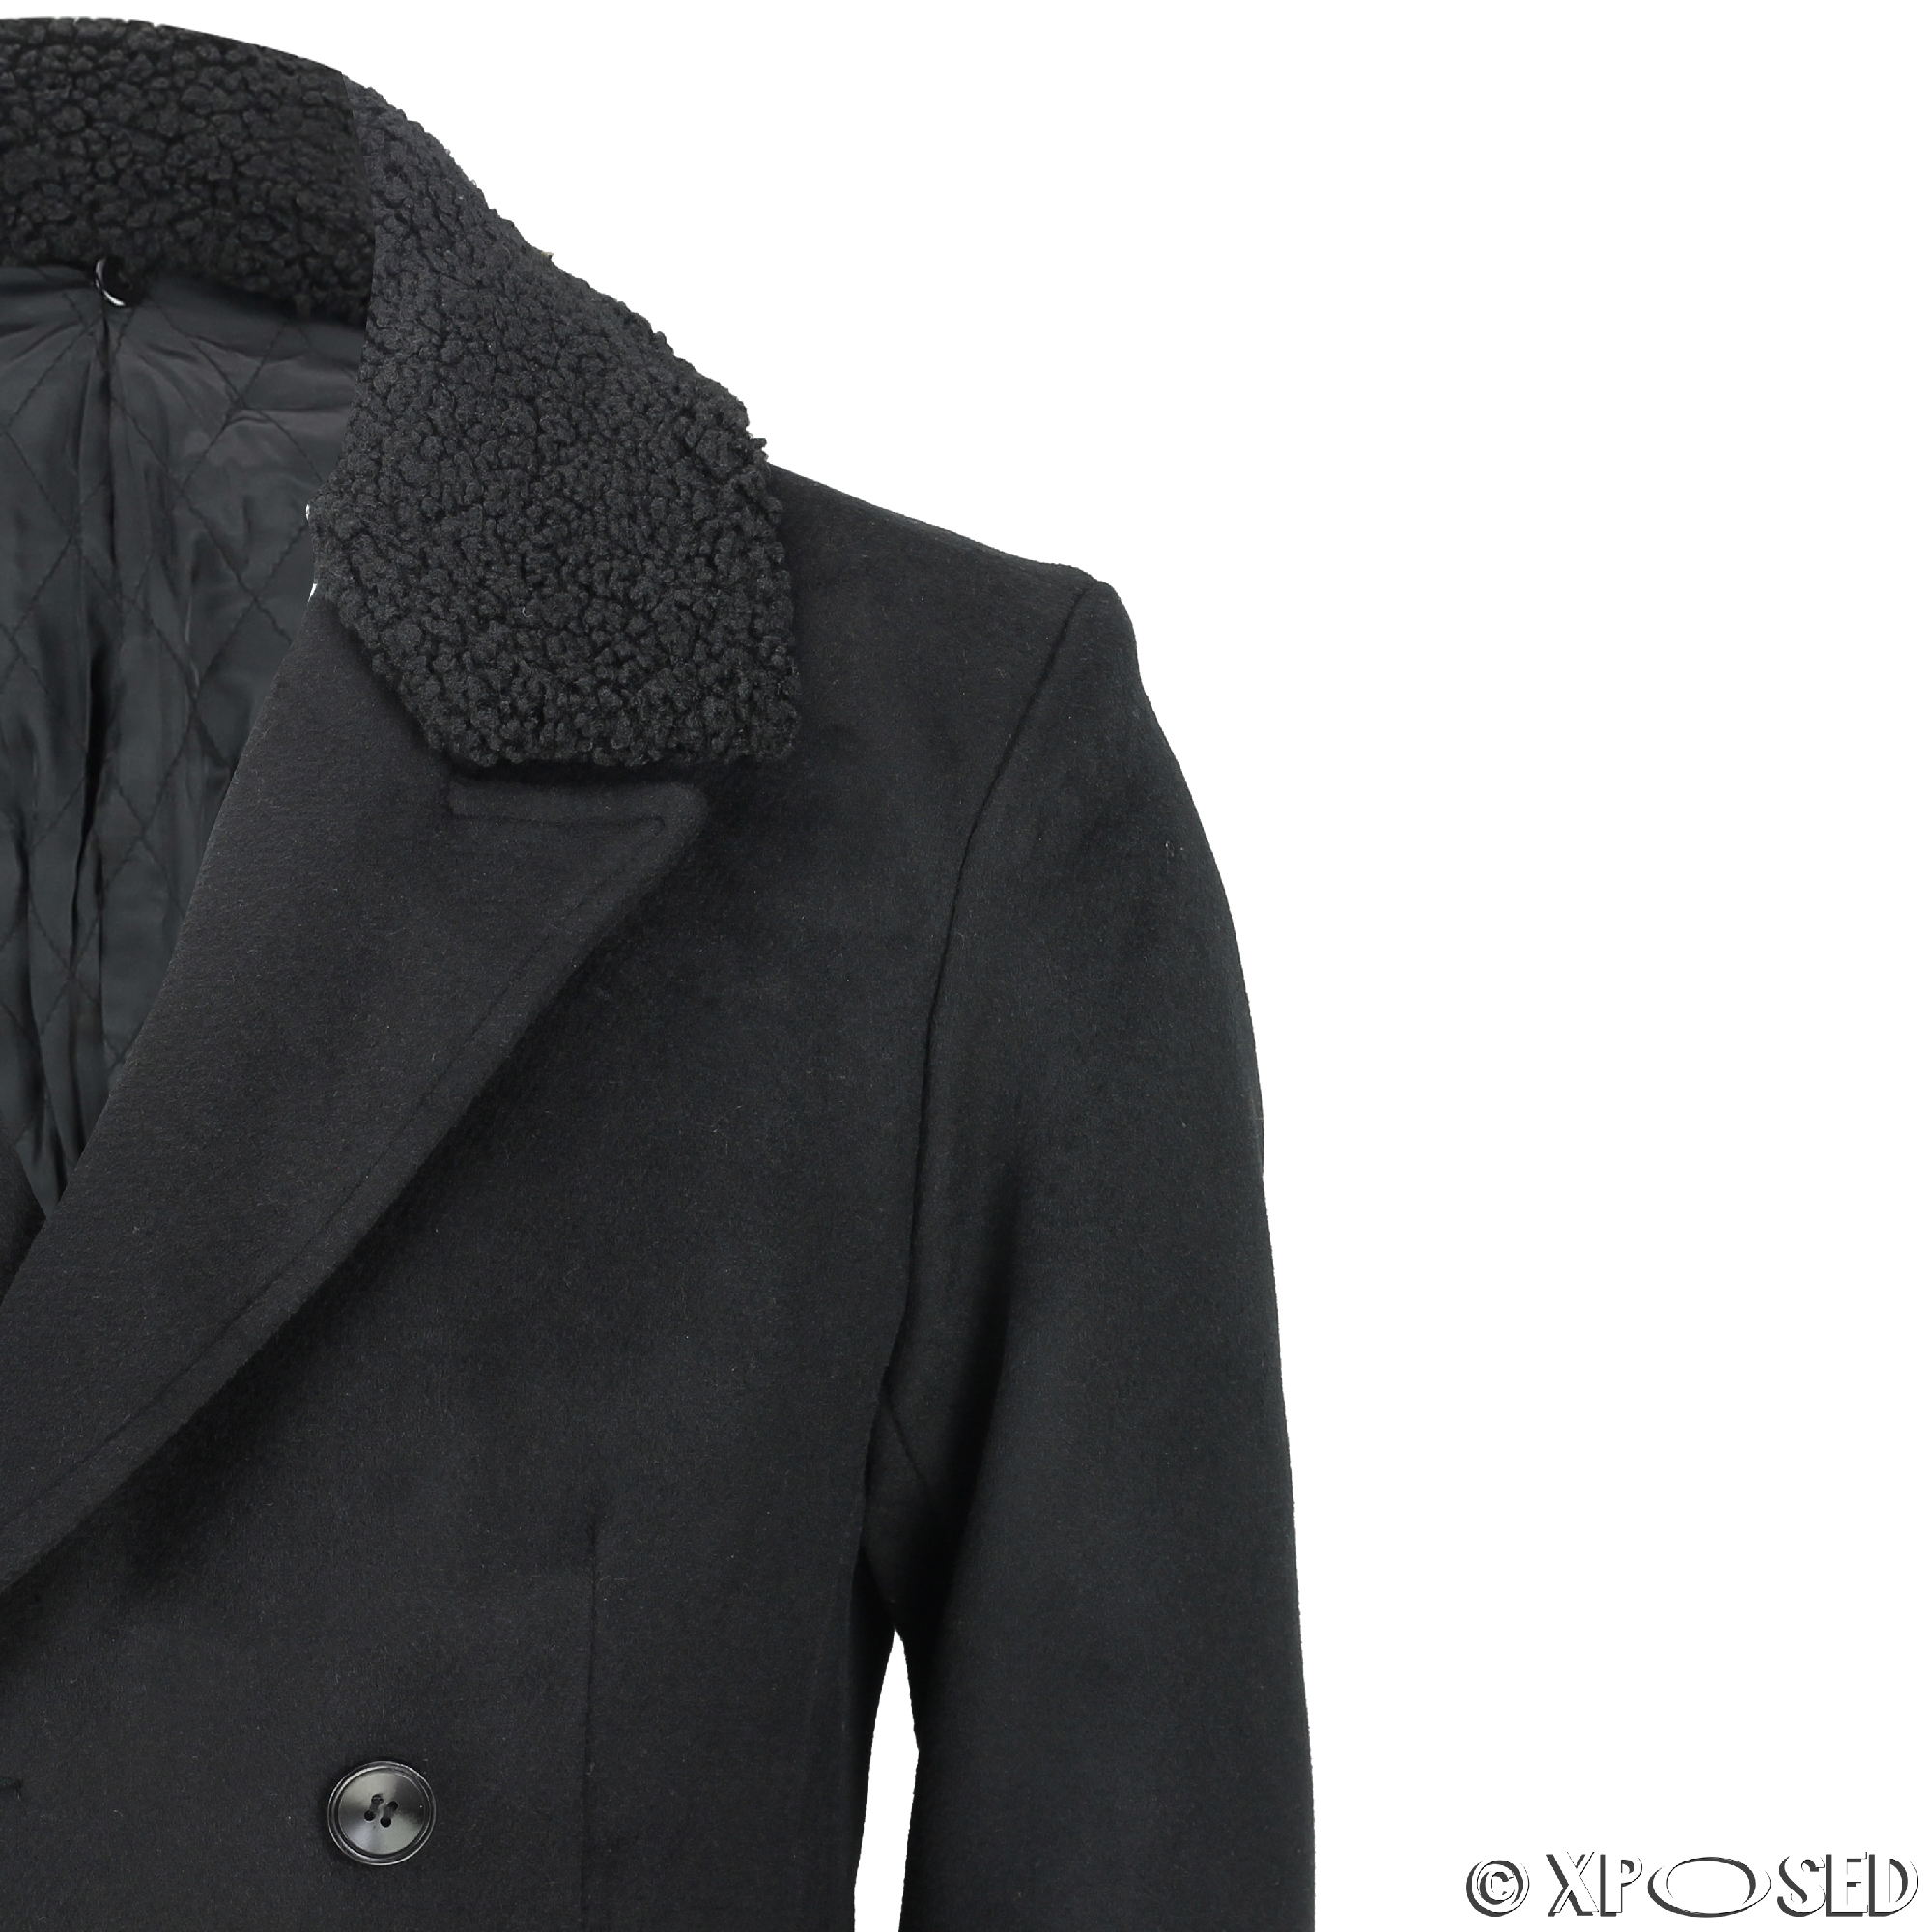 mens black maroon double breasted overcoat detachable fur collar slim fit jacket ebay. Black Bedroom Furniture Sets. Home Design Ideas